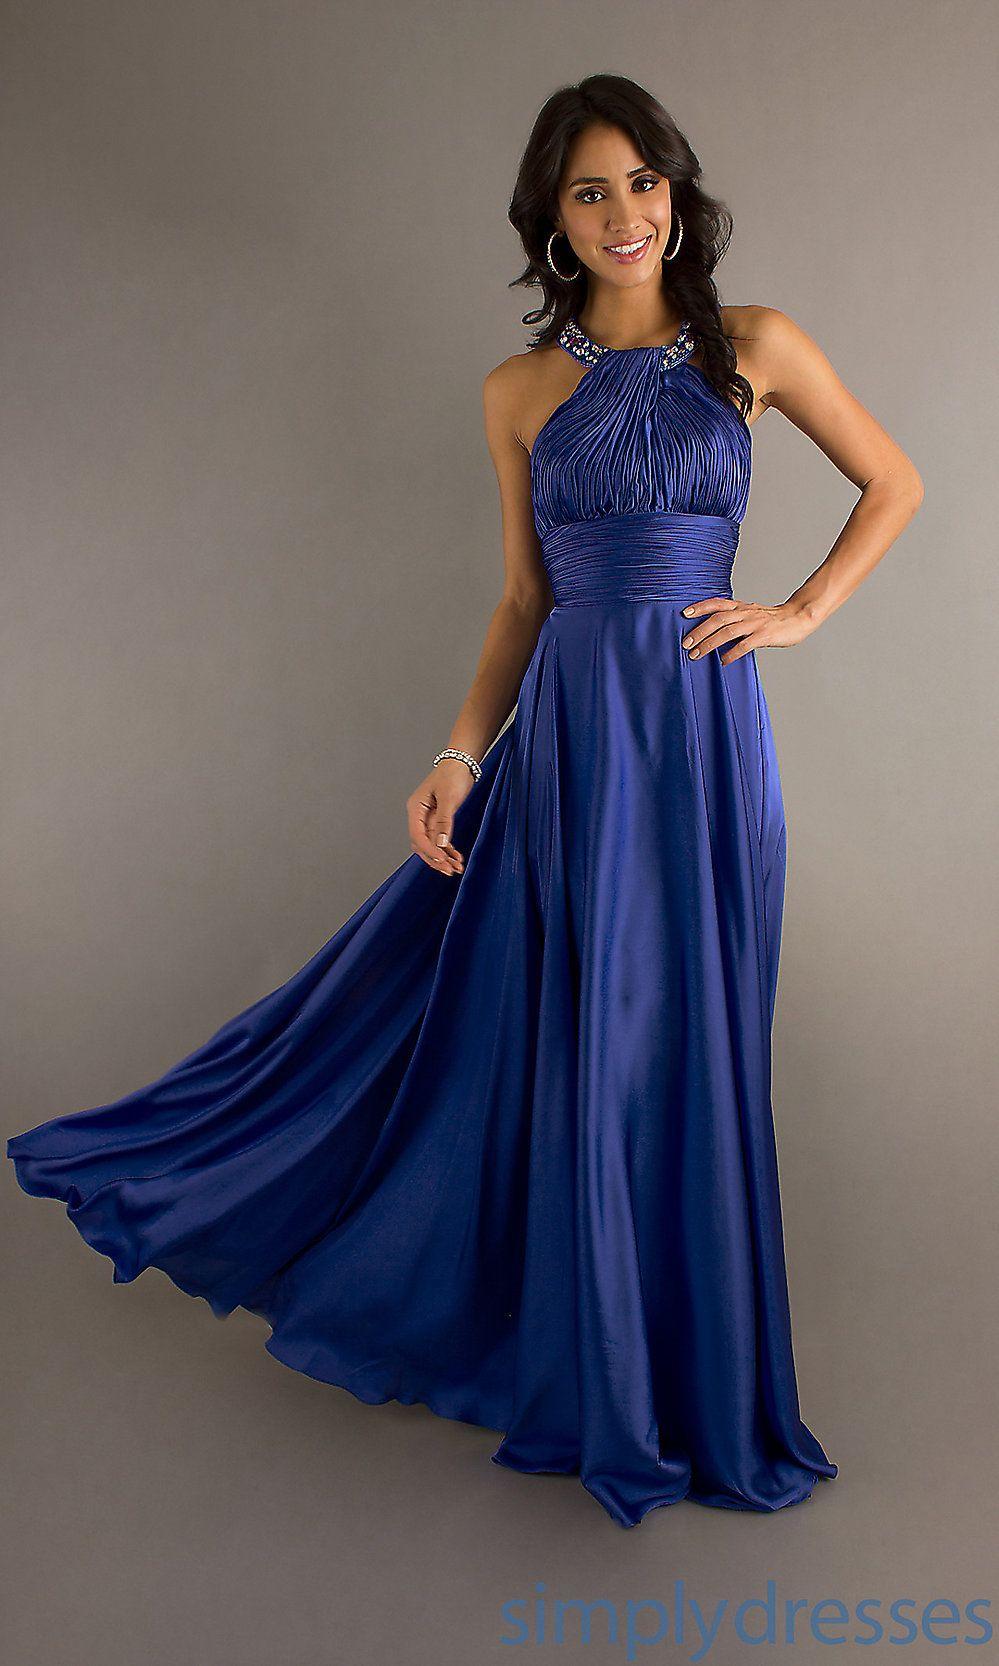 High neck long dress halter top evening dresses simply dresses